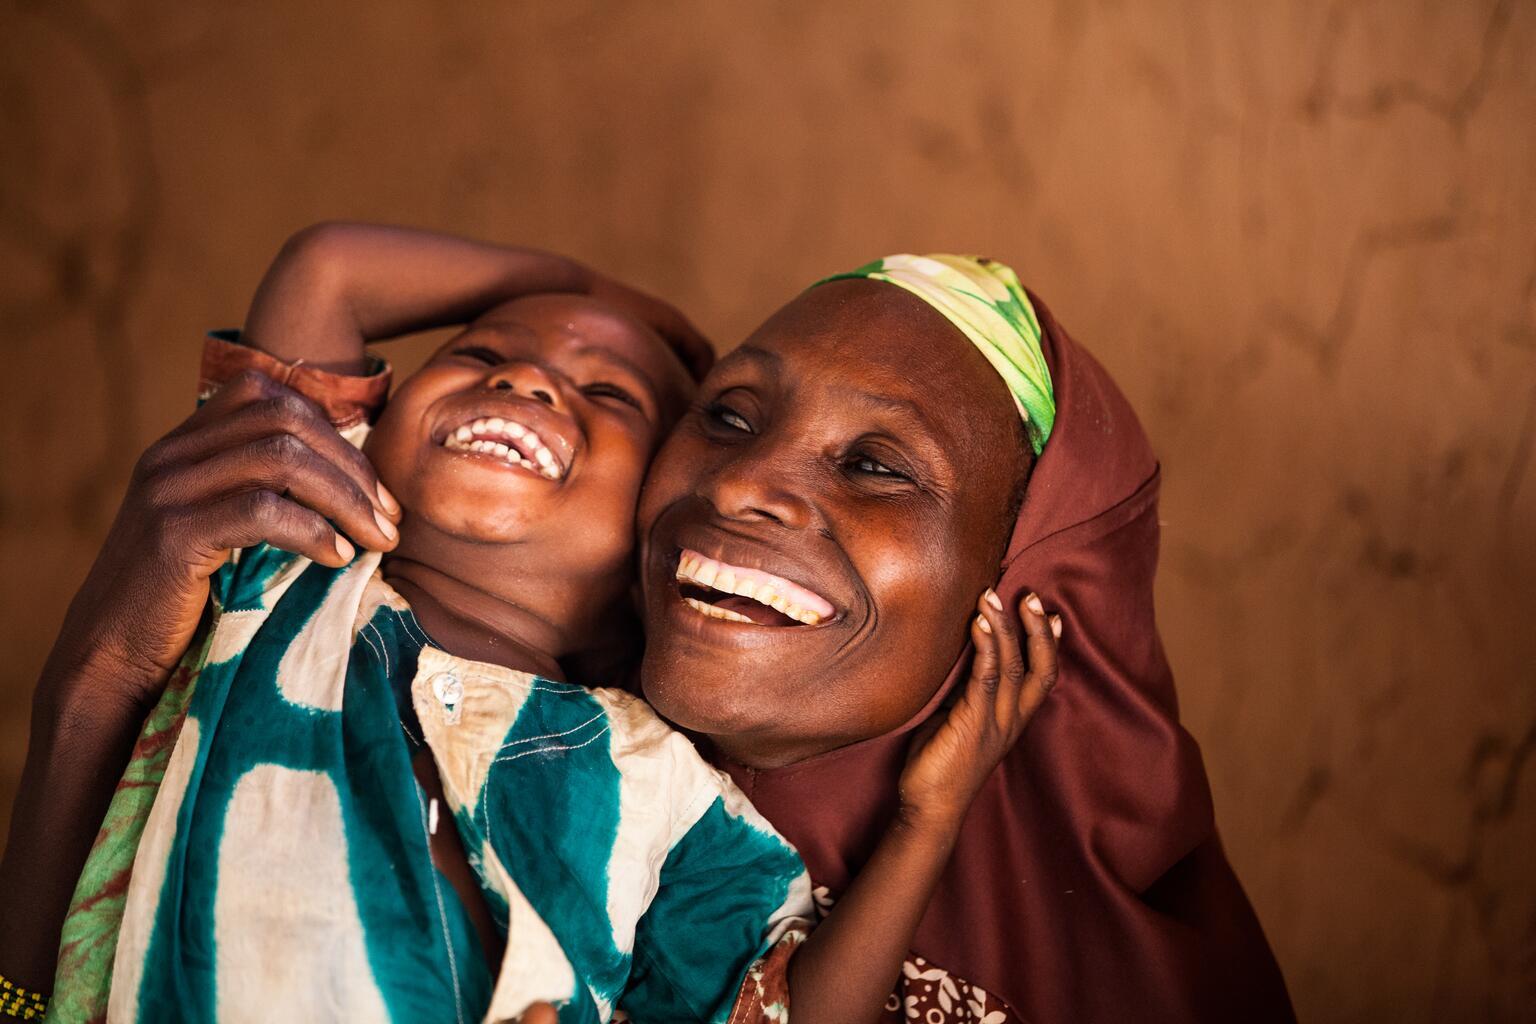 Bild zu Muttertag, UNICEF, United Internet for UNICEF